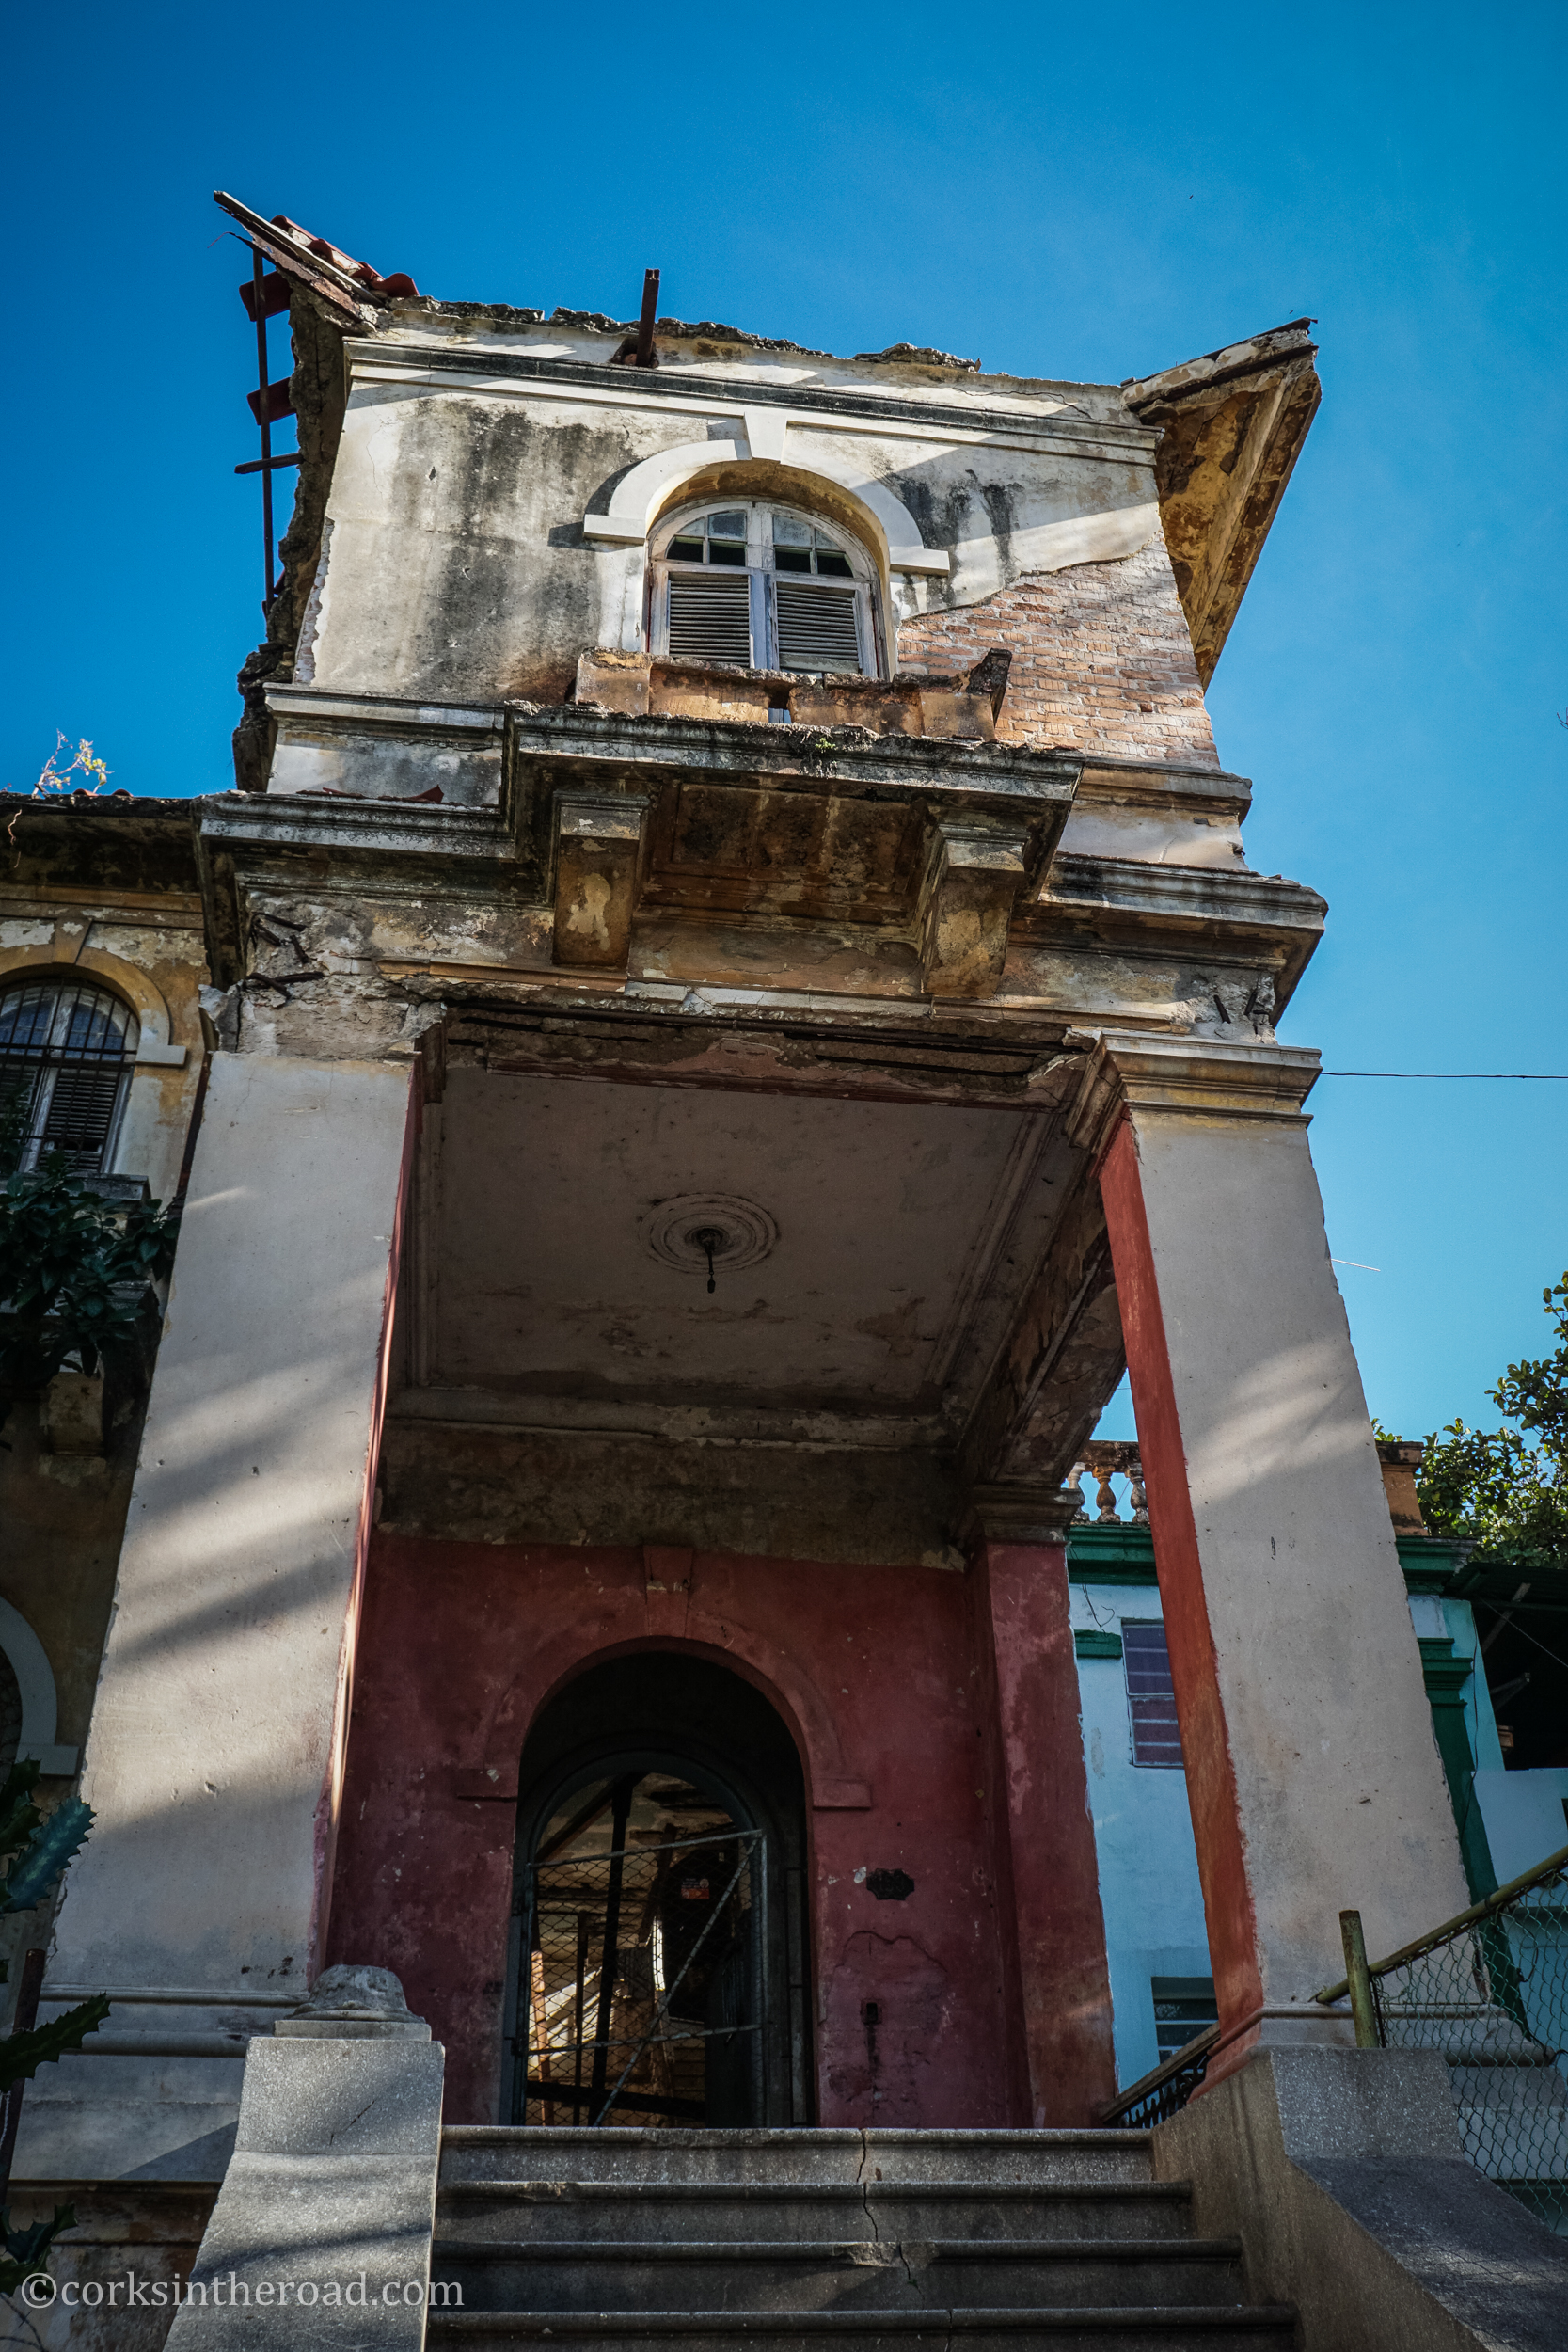 Architecture, Corksintheroad, Cuba, Havana-23.jpg